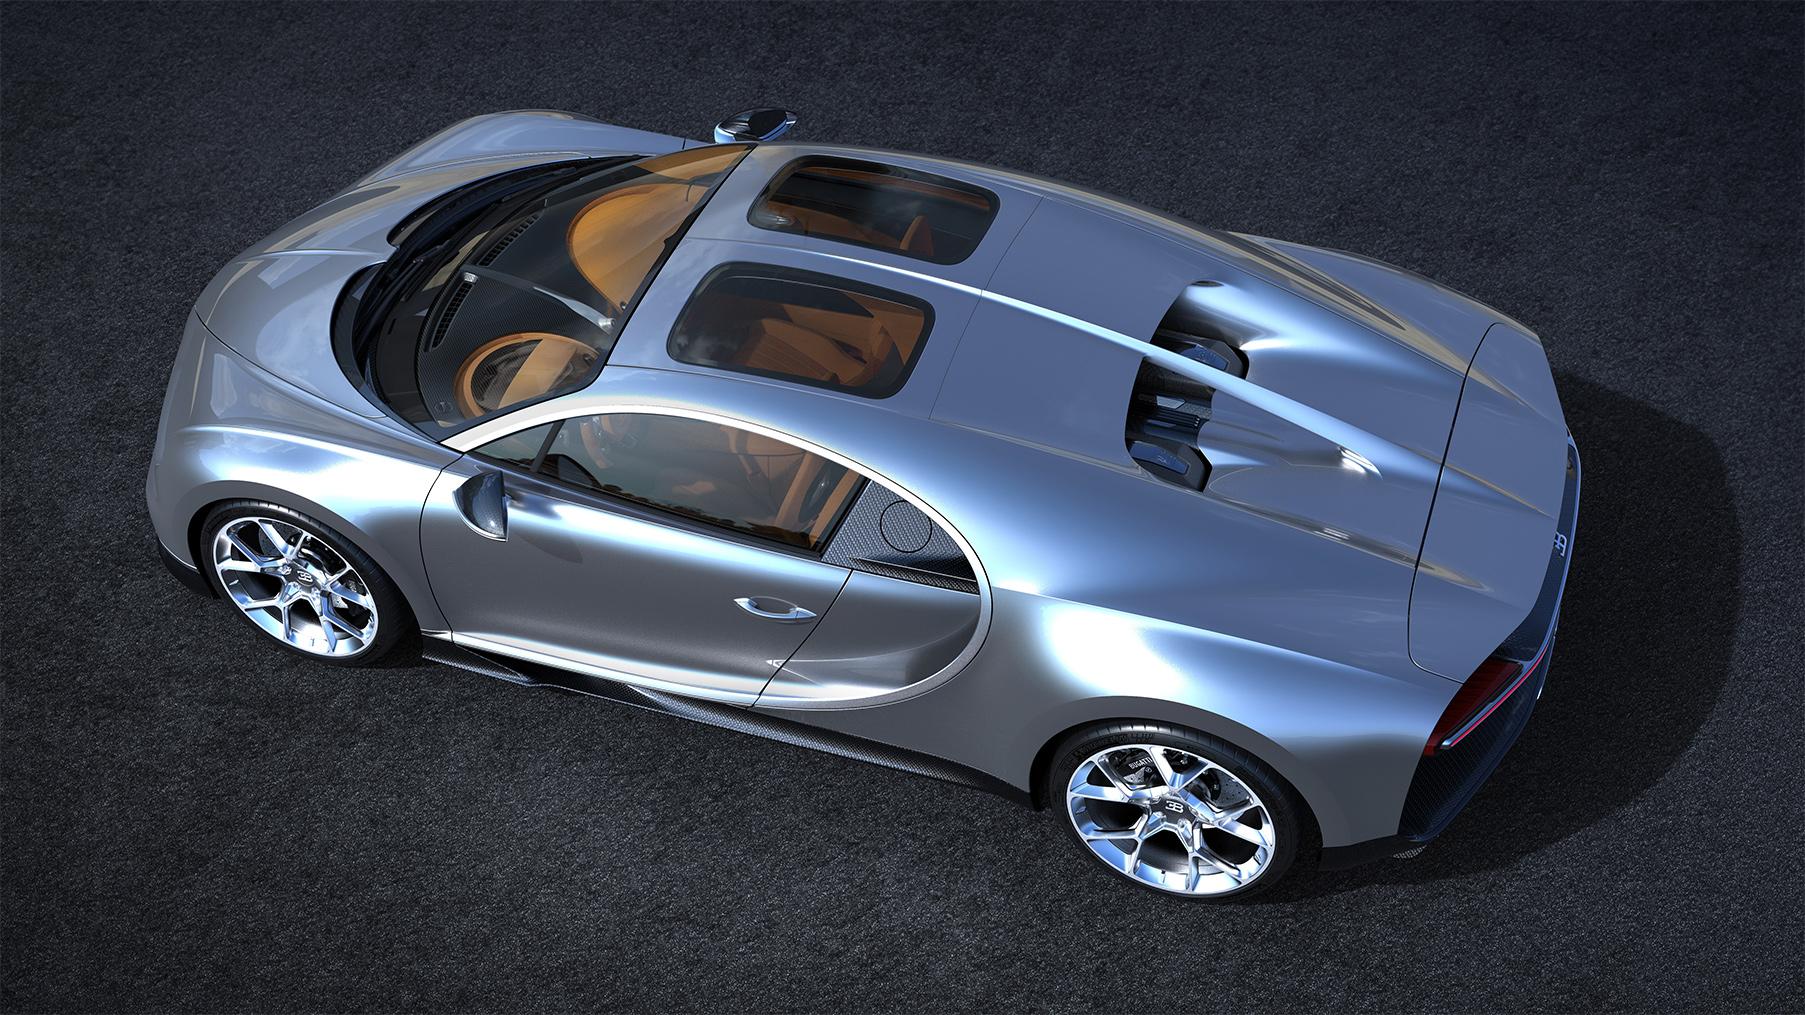 TrackWorthy - Bugatti Chiron Sky View (2)